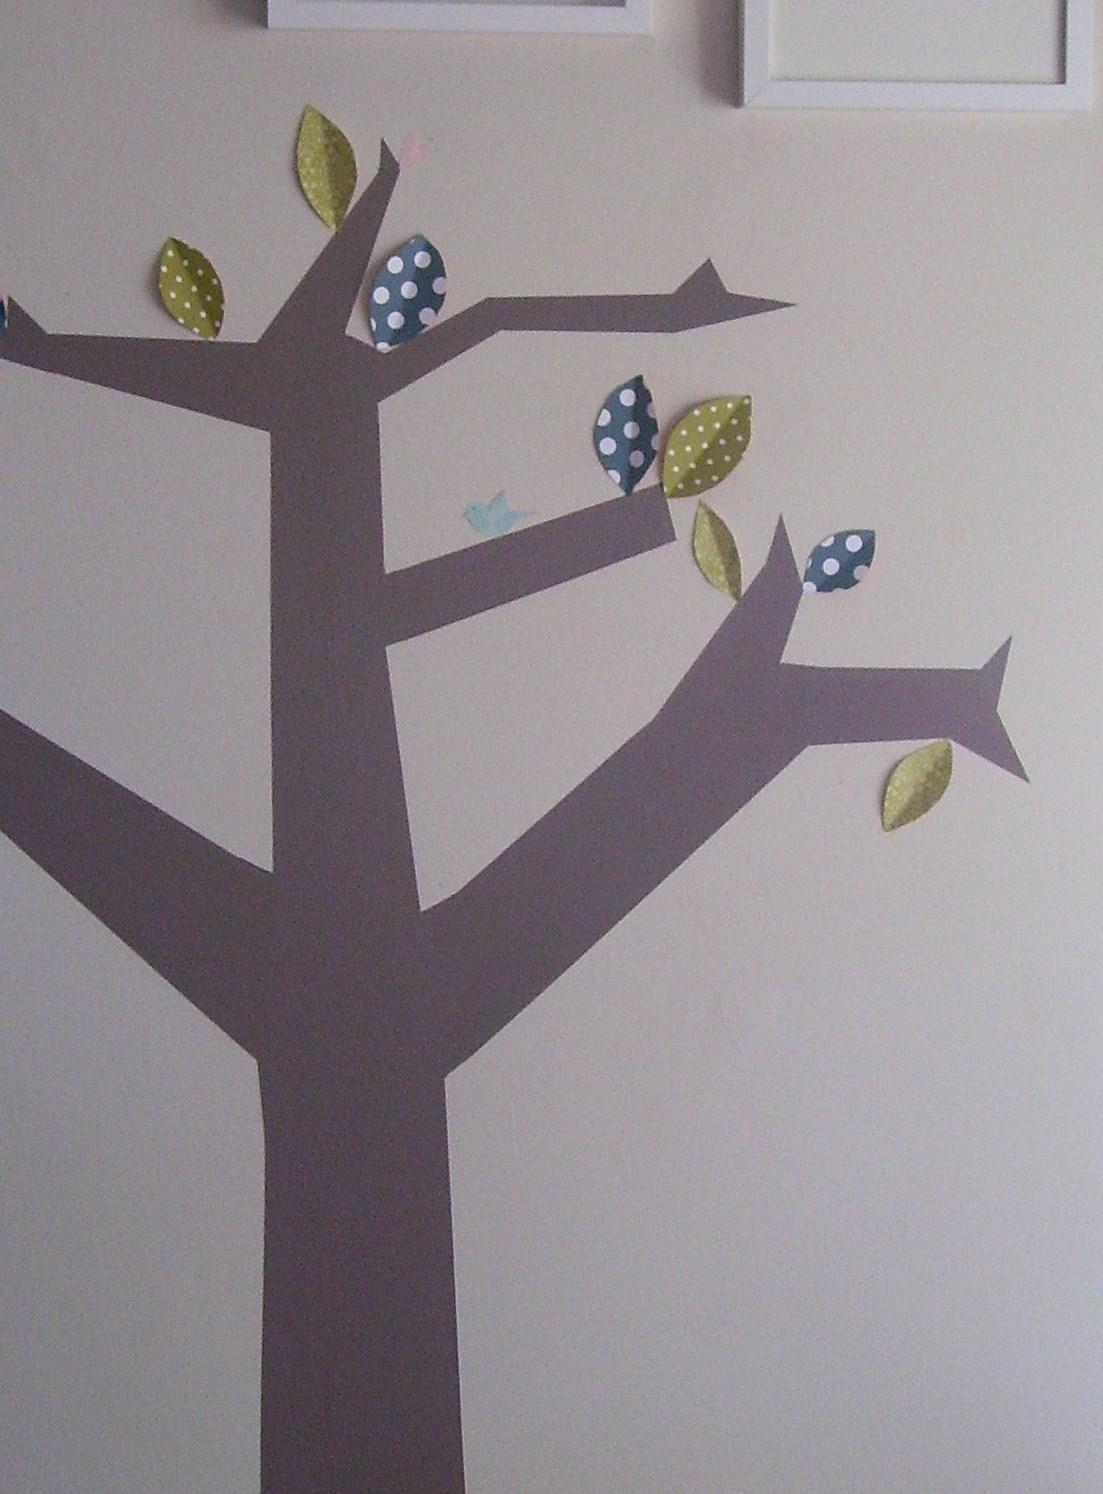 http://2.bp.blogspot.com/_0n-DxLsp7A4/S7mH7K1qbjI/AAAAAAAABCA/RfpoZRwDd6s/s1600/papertreedesigns_papertree_closup.jpg